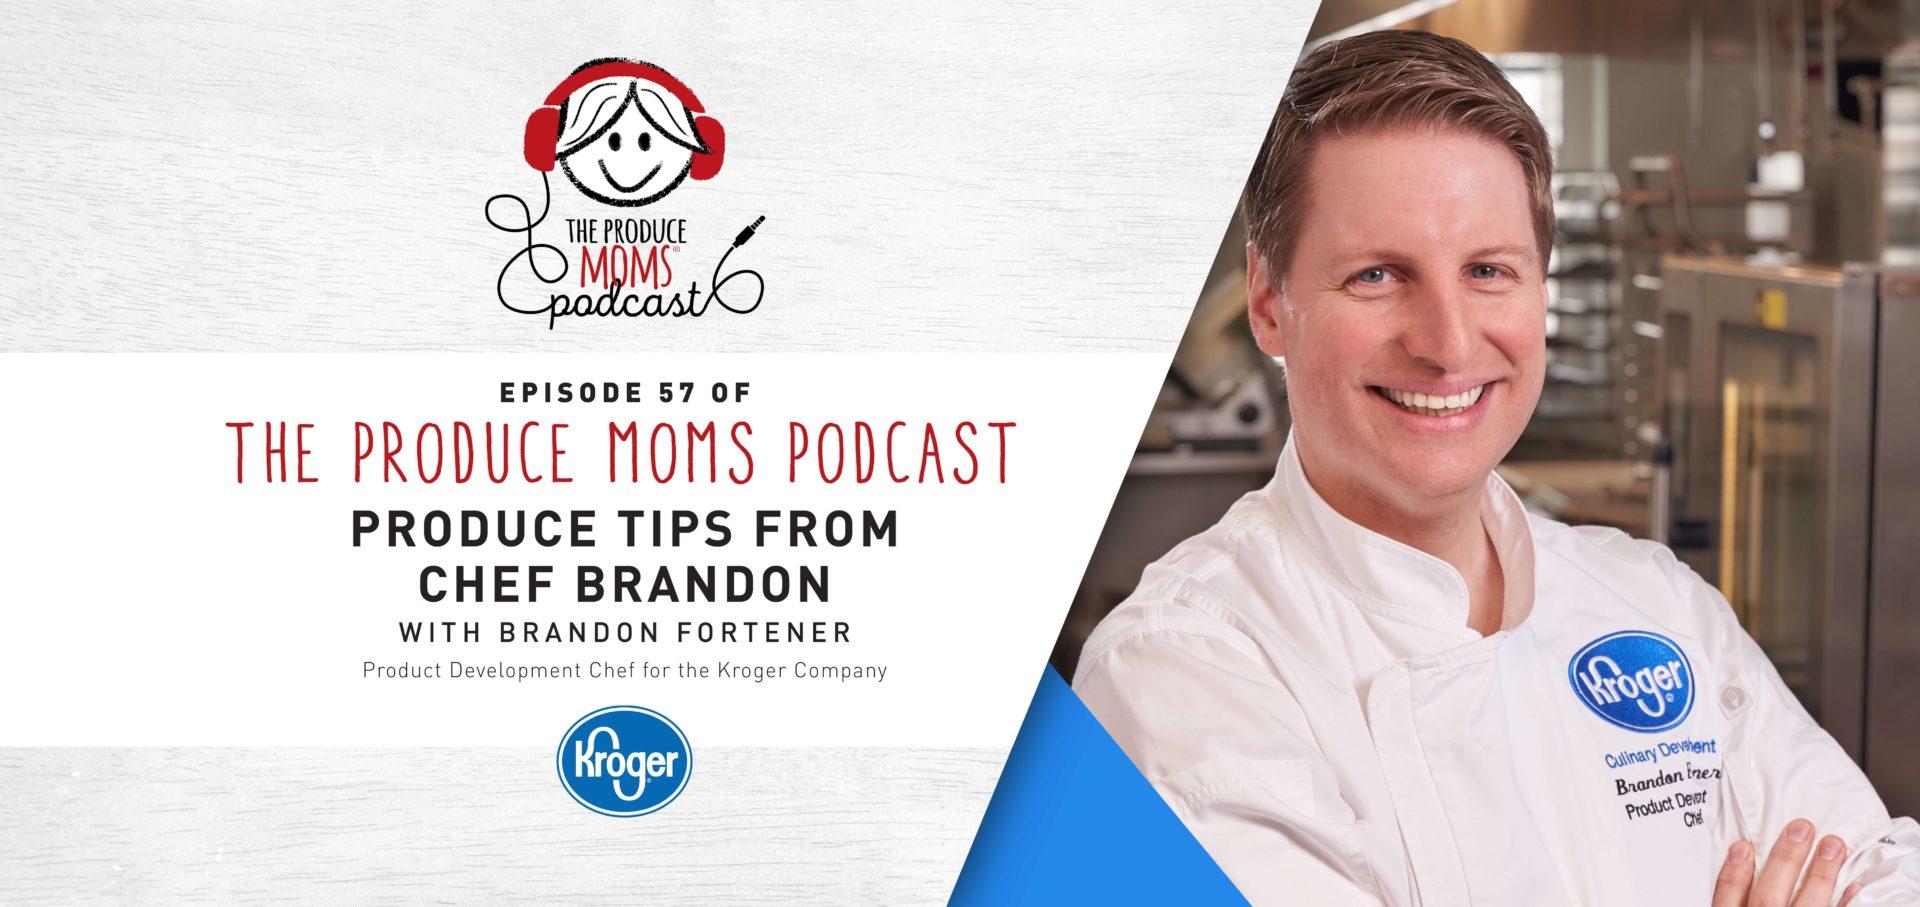 Episode 57: Produce Tips from Kroger Chef Brandon Fortener